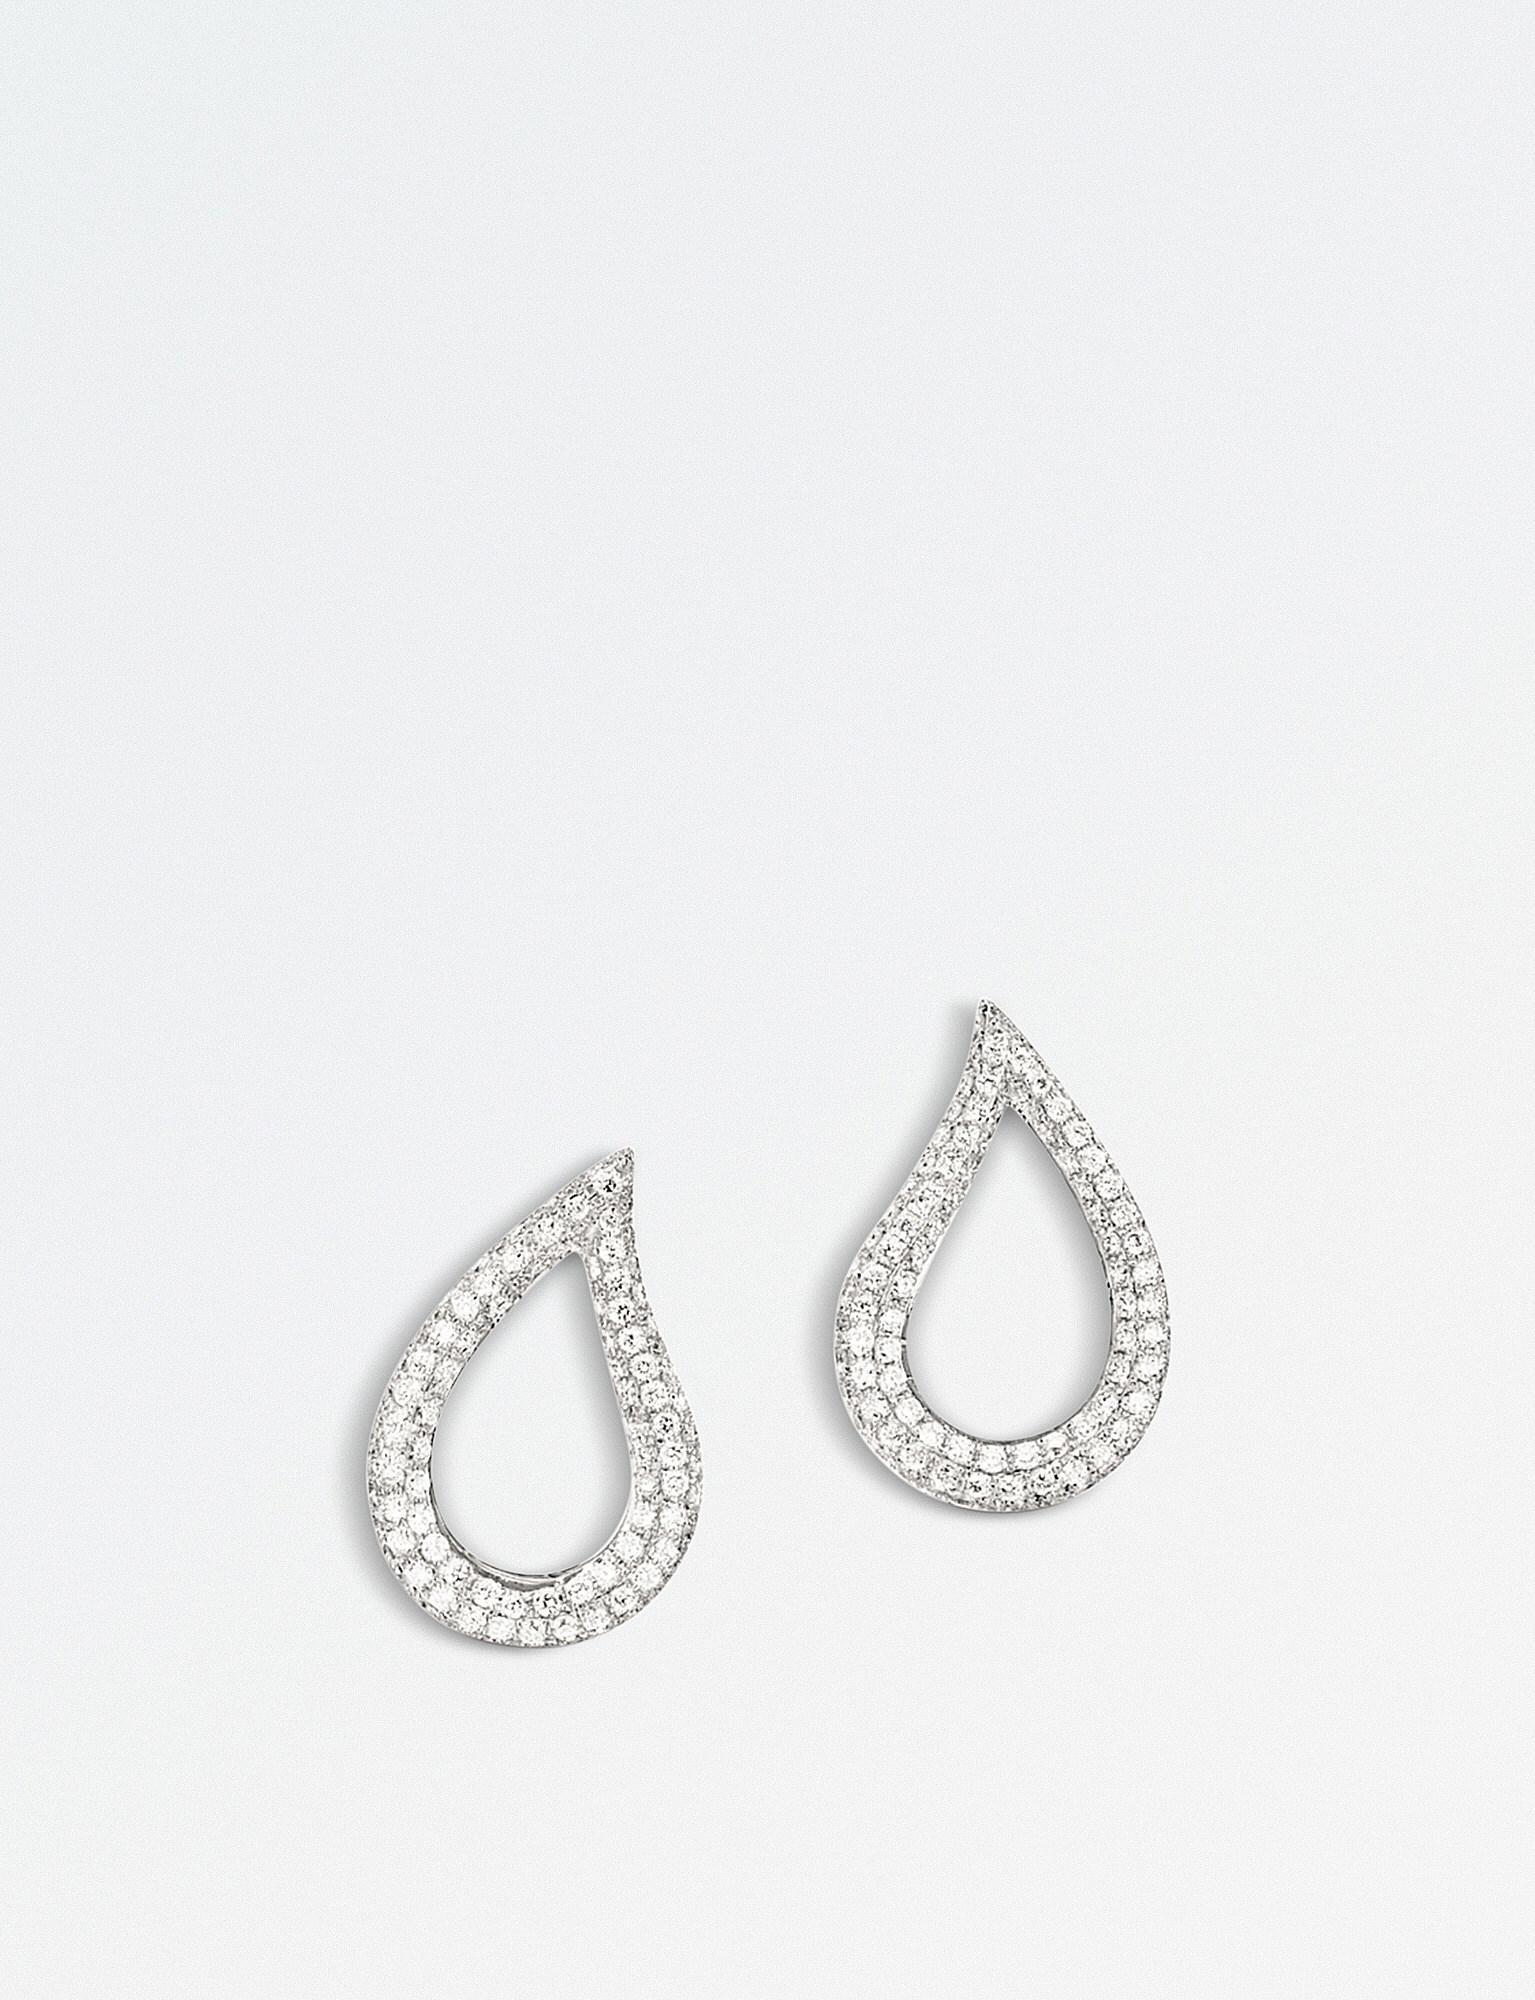 Lyst Bucherer Jewellery Lacrima 18k White gold And Diamond